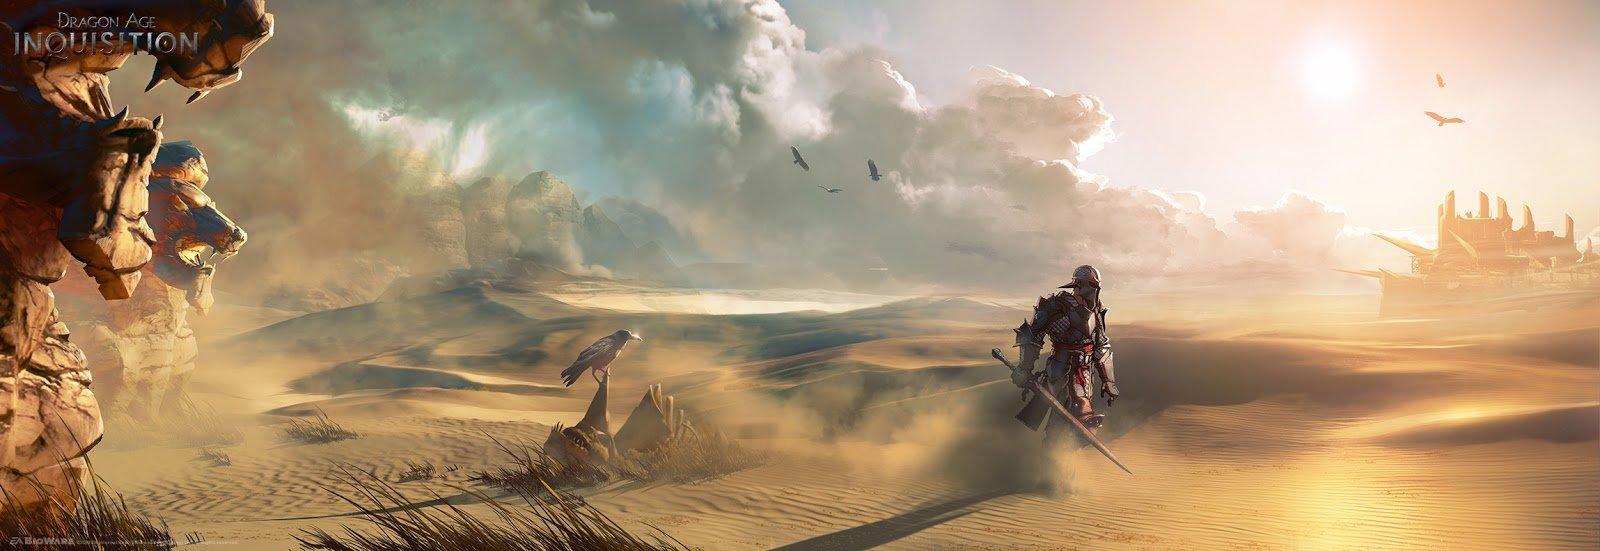 Мафия #6: Dragon Age. Завязка - Изображение 5